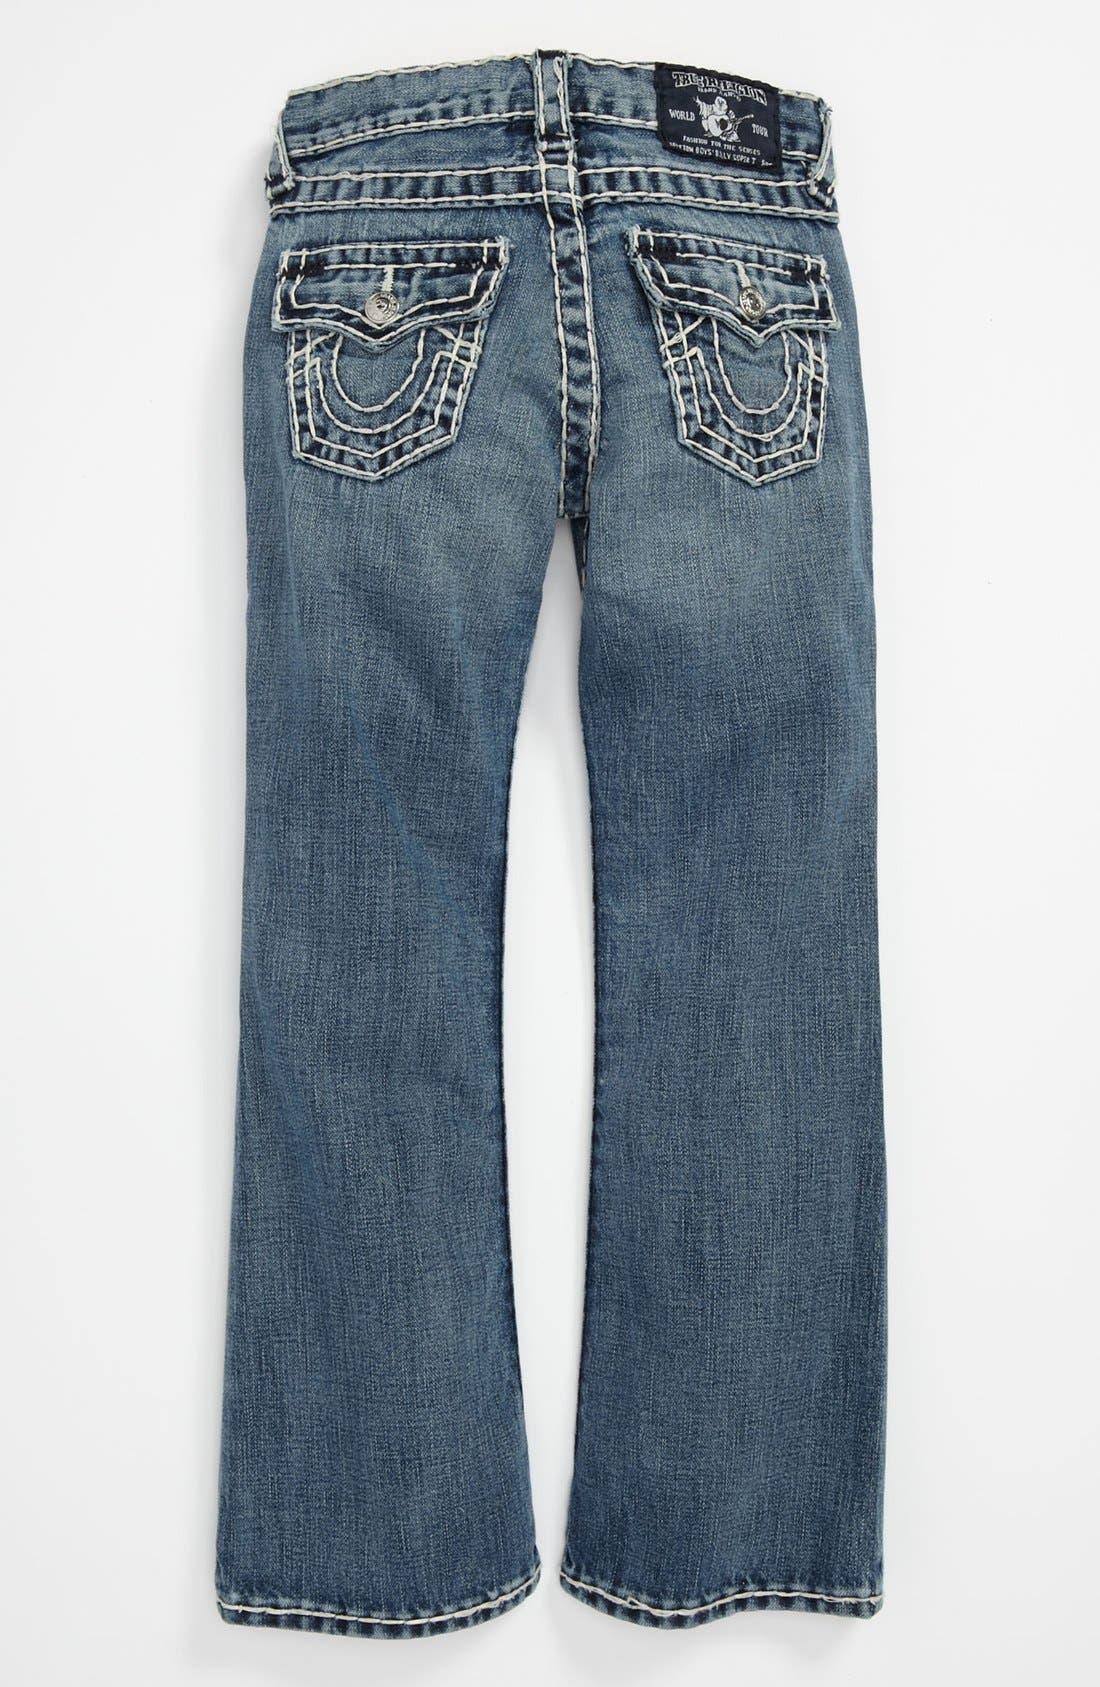 Main Image - True Religion Brand Jeans 'Jack' Bootcut Jeans (Big Boys)